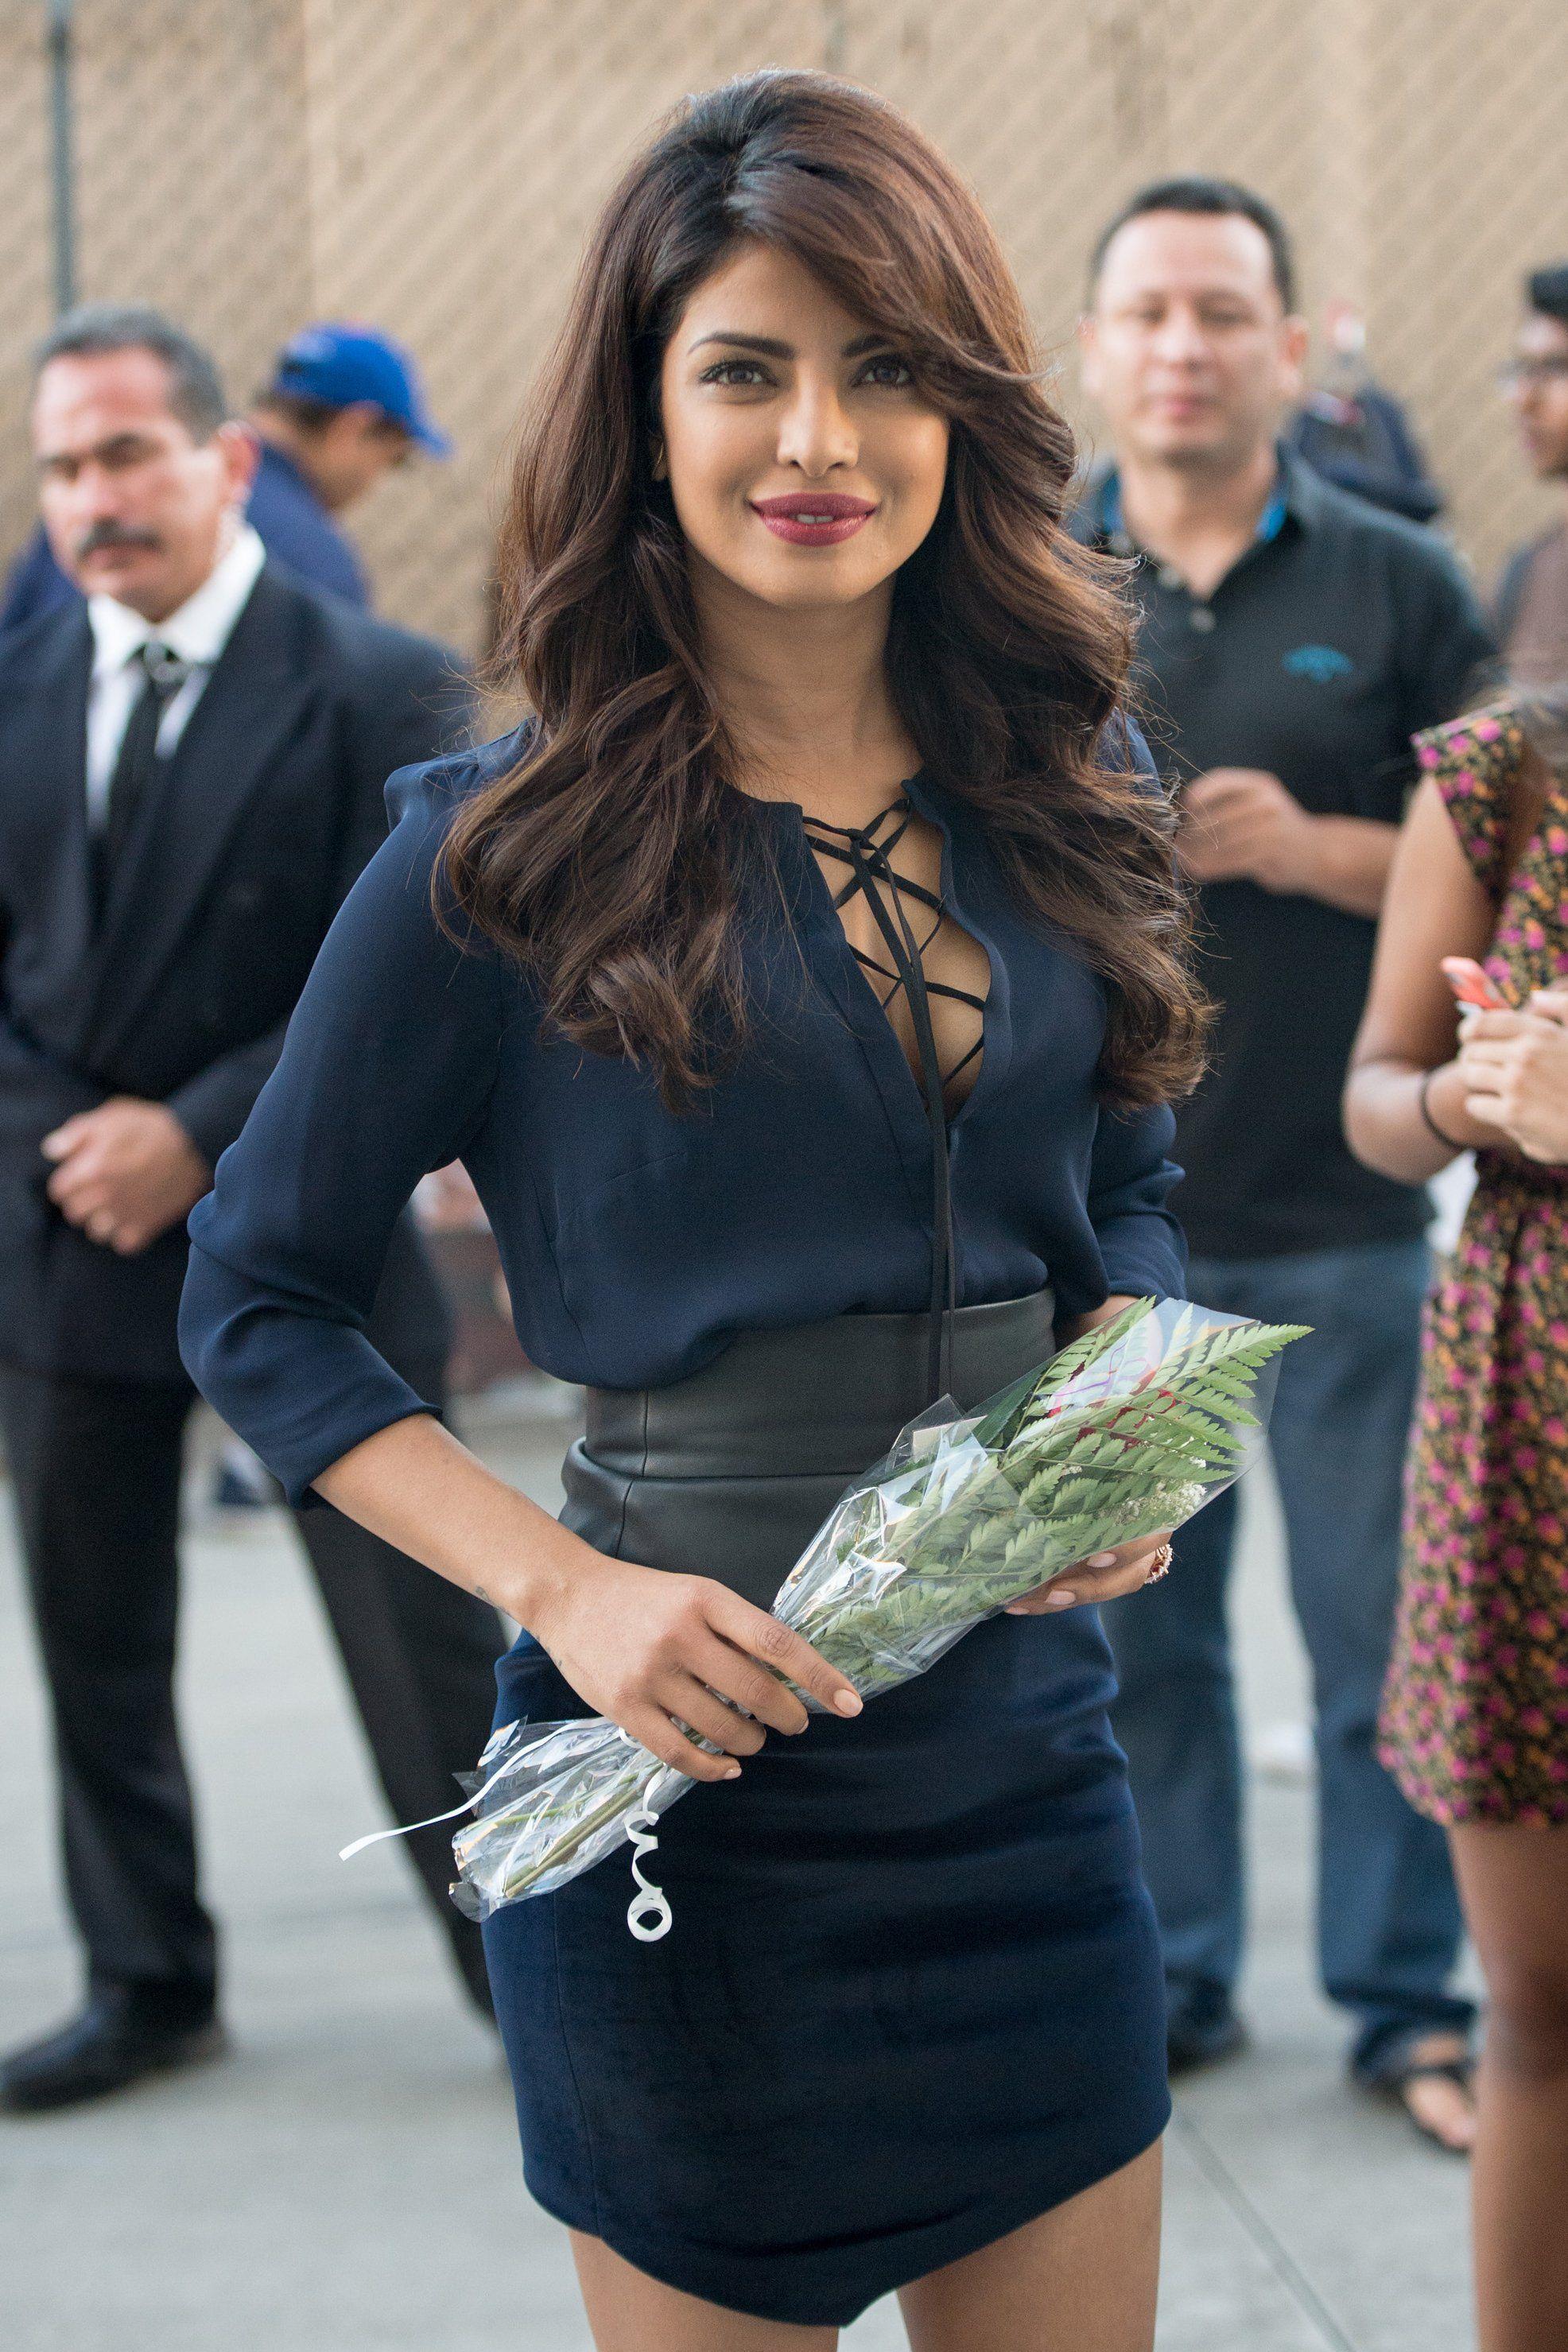 WHO Priyanka Chopra WHERE On the street, Los Angeles  WHEN September 30, 2015 is part of Priyanka chopra hair -